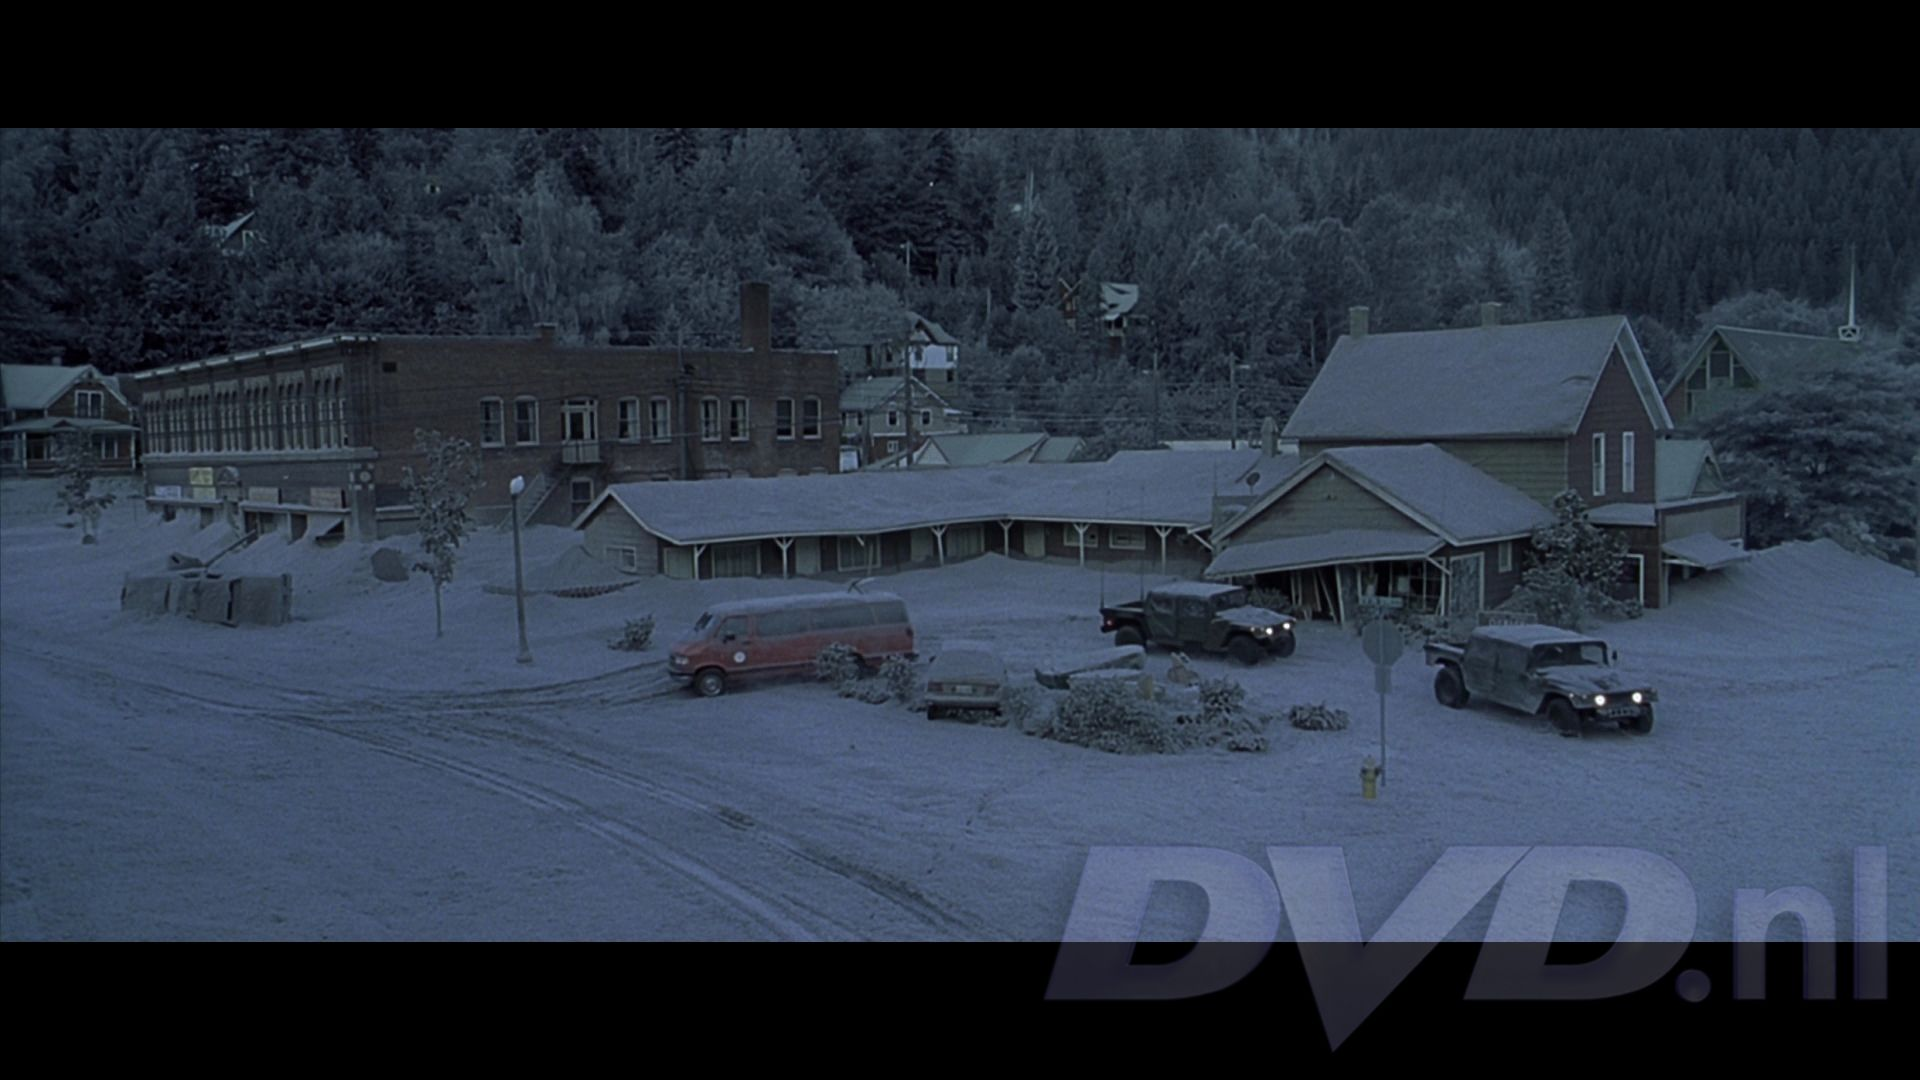 Dante's Peak Dante, Peak, Movies